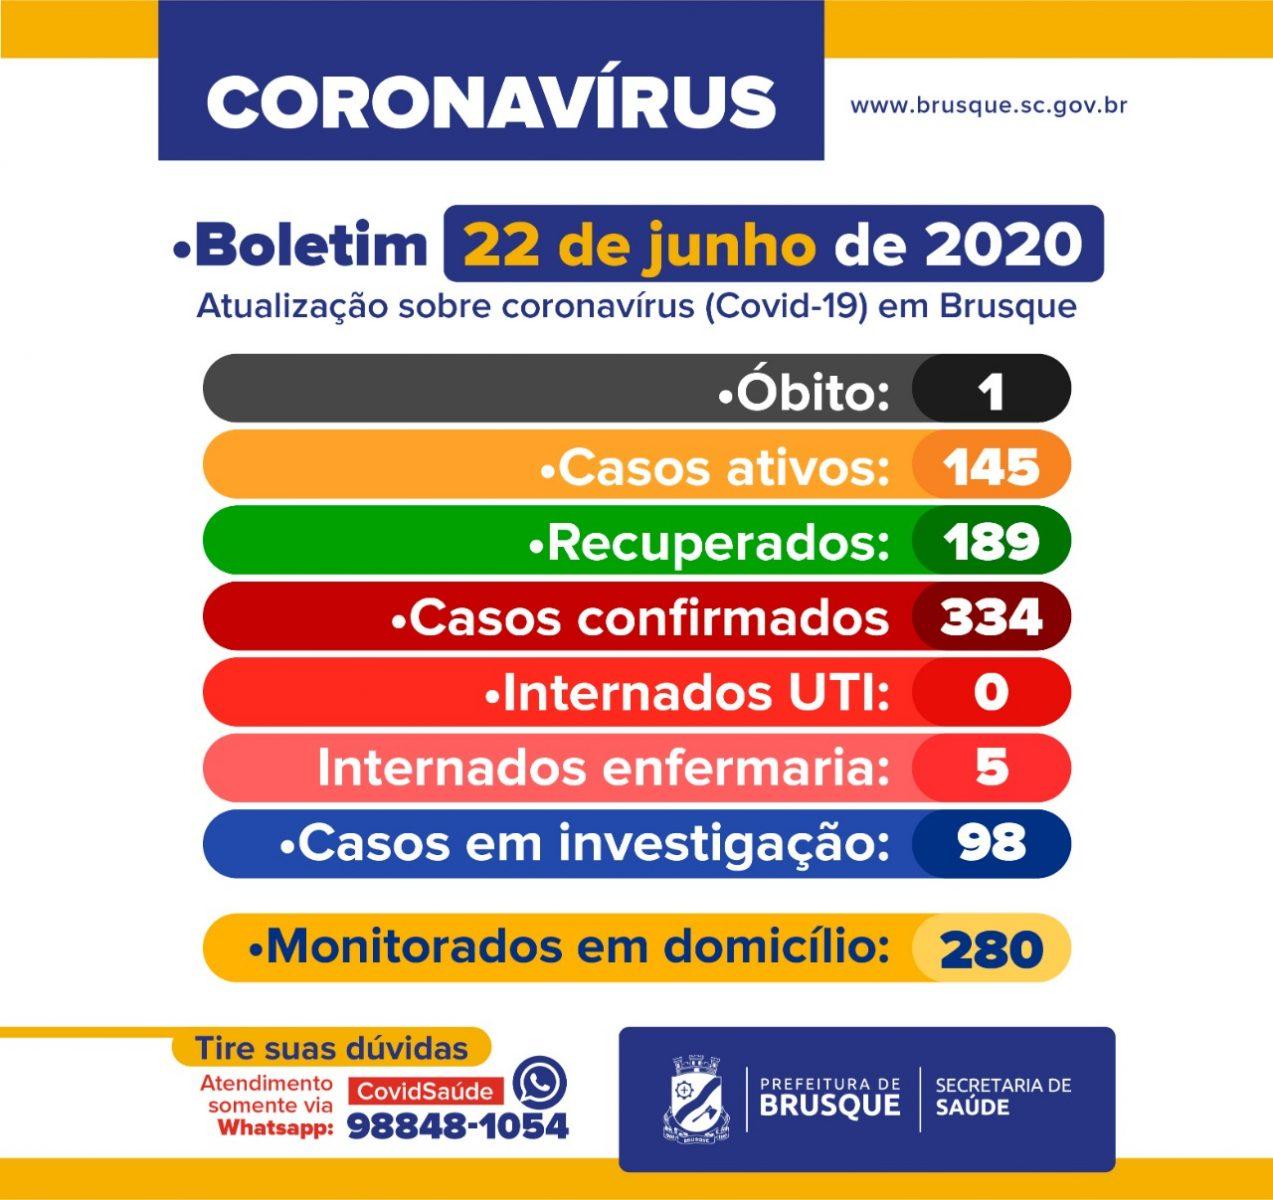 Confira o boletim epidemiológico da Prefeitura de Brusque dessa segunda-feira (22)